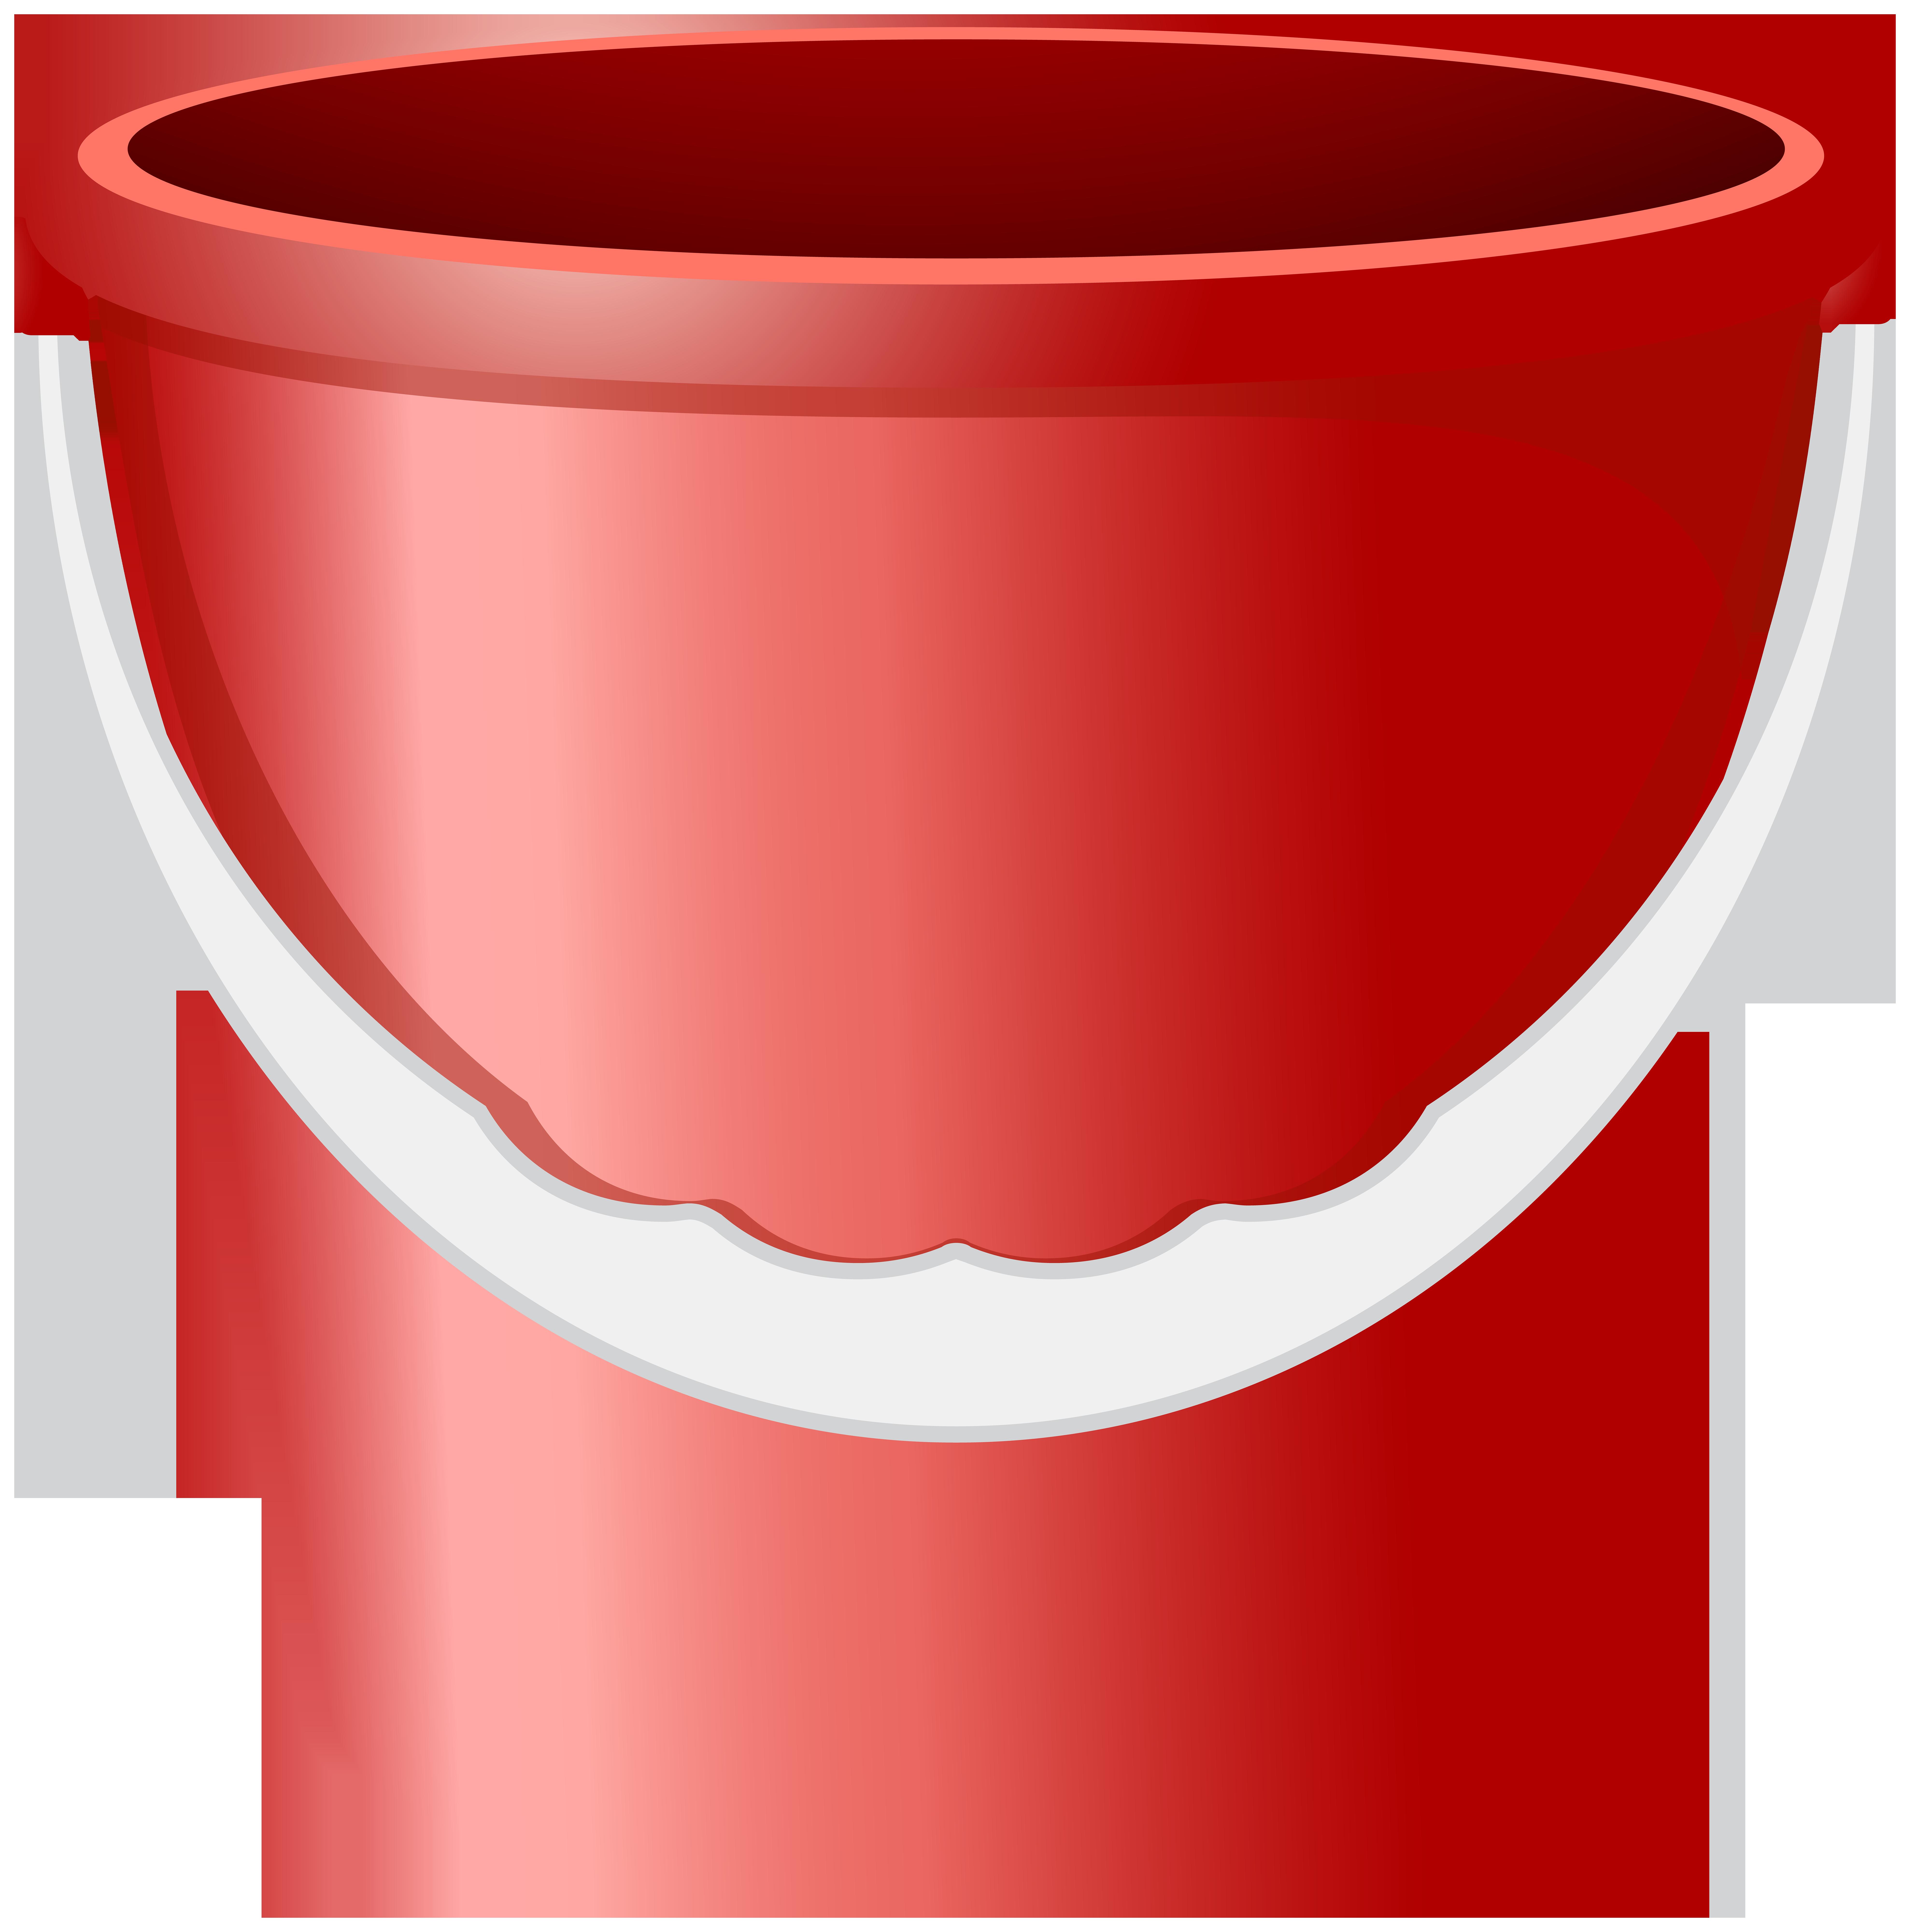 Png clip art image. Bucket clipart red bucket